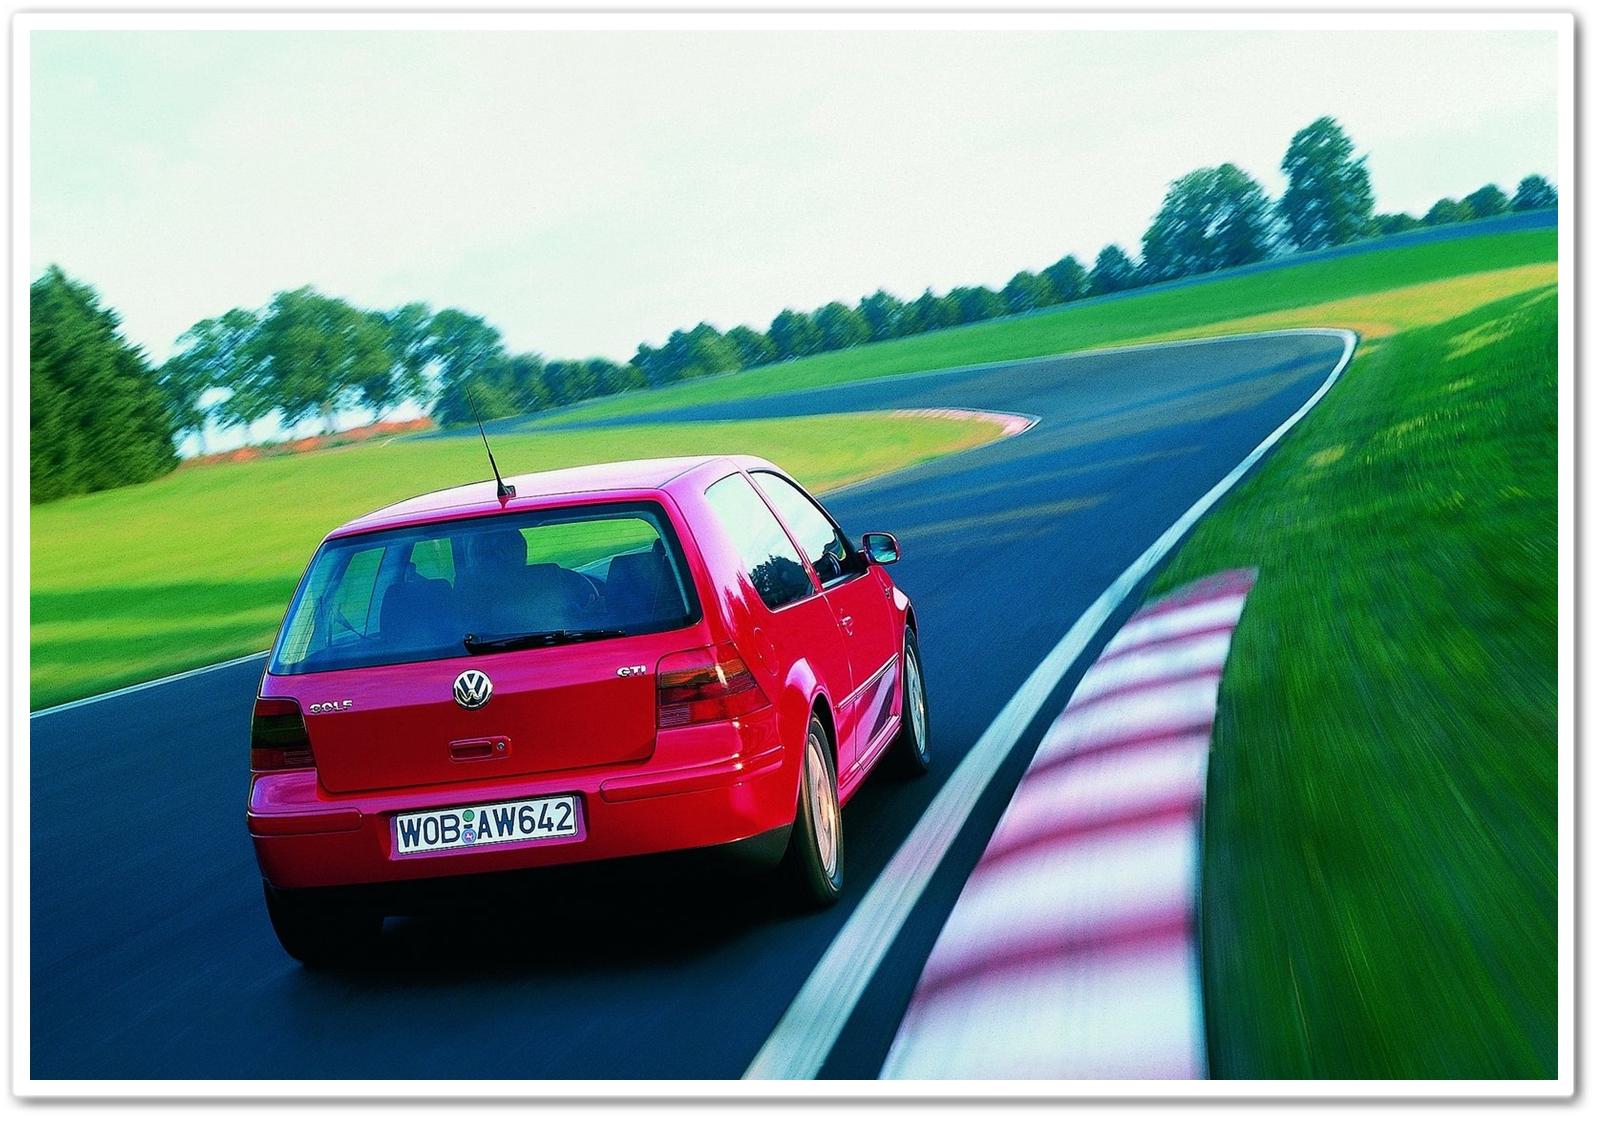 http://3.bp.blogspot.com/-9xfpcOlTRF8/UVrzZIwlk_I/AAAAAAAADT4/3GtkiOKcY6c/s1600/Volkswagen-Golf_IV_GTI_1998_1600x1200_wallpaper_0e.jpg